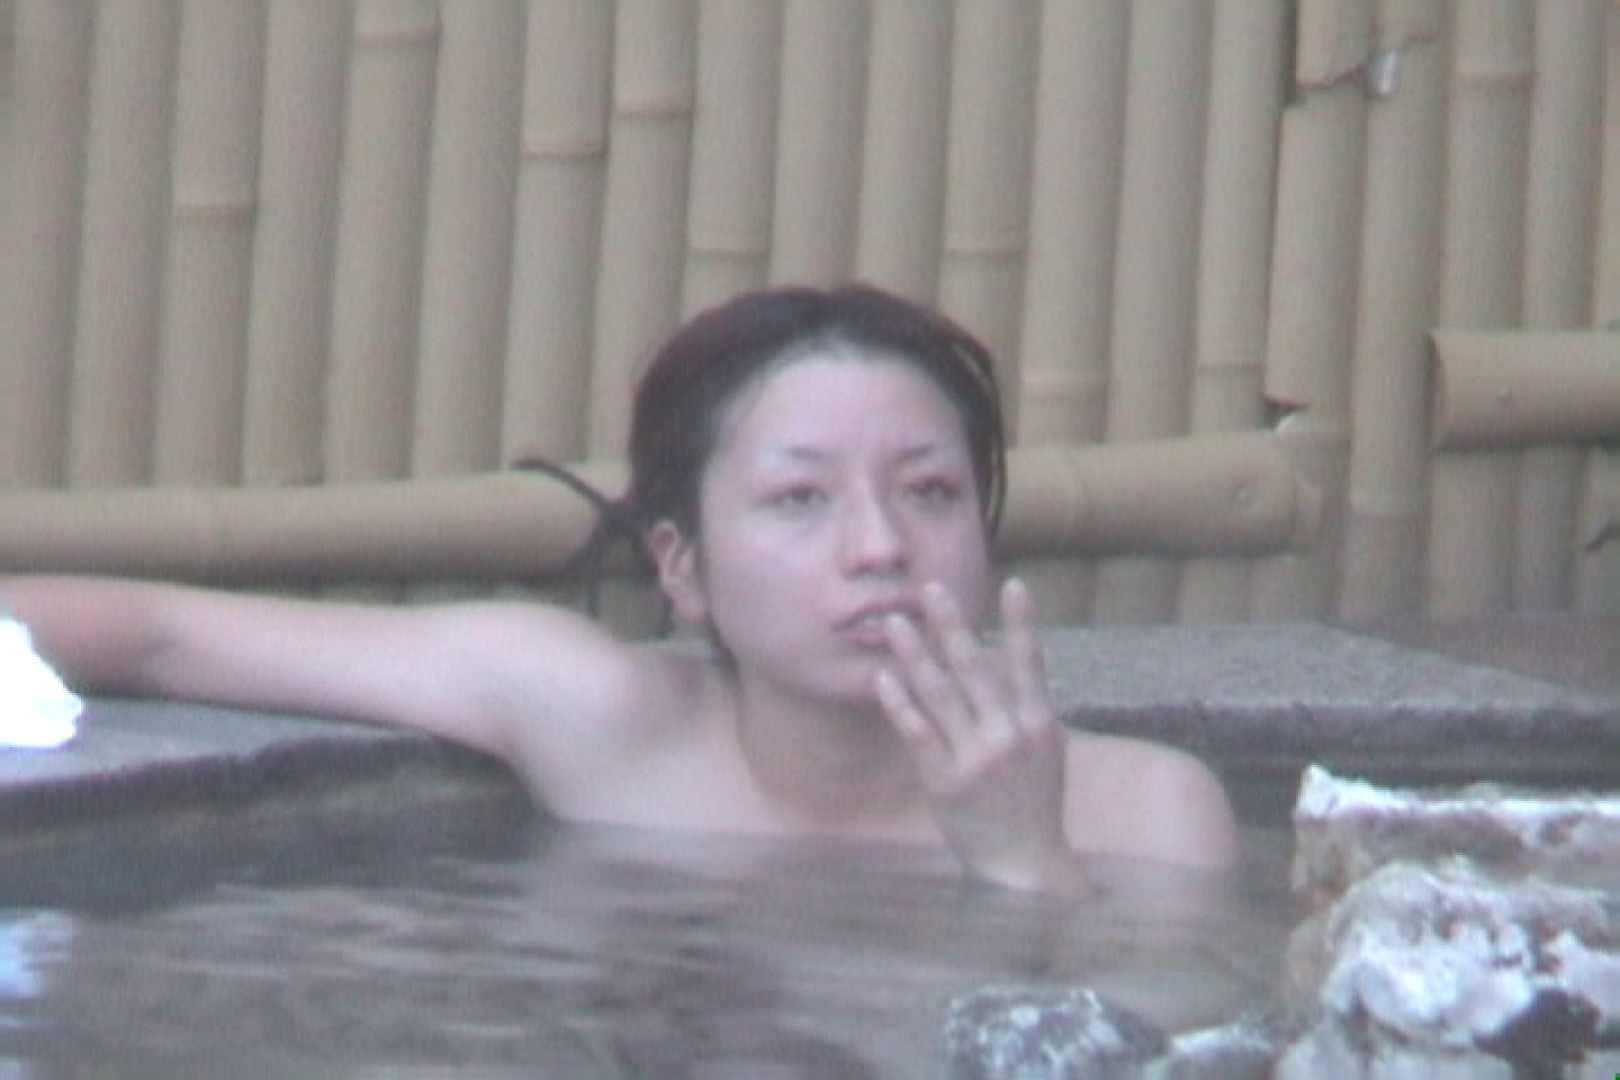 Aquaな露天風呂Vol.608 HなOL | 盗撮  89pic 69